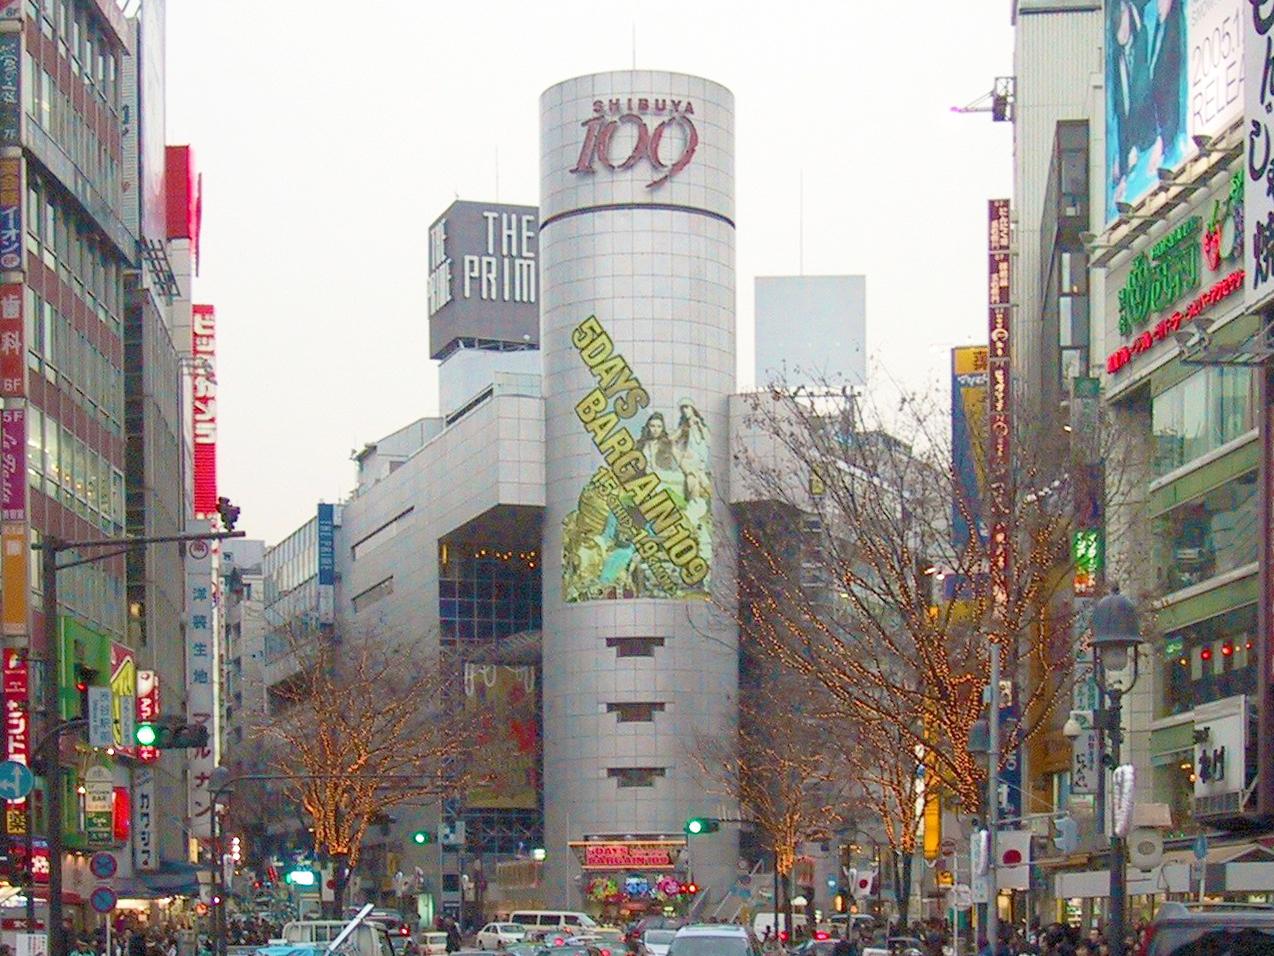 File:Shibuya 109 Building Tokyo January 2006.jpg